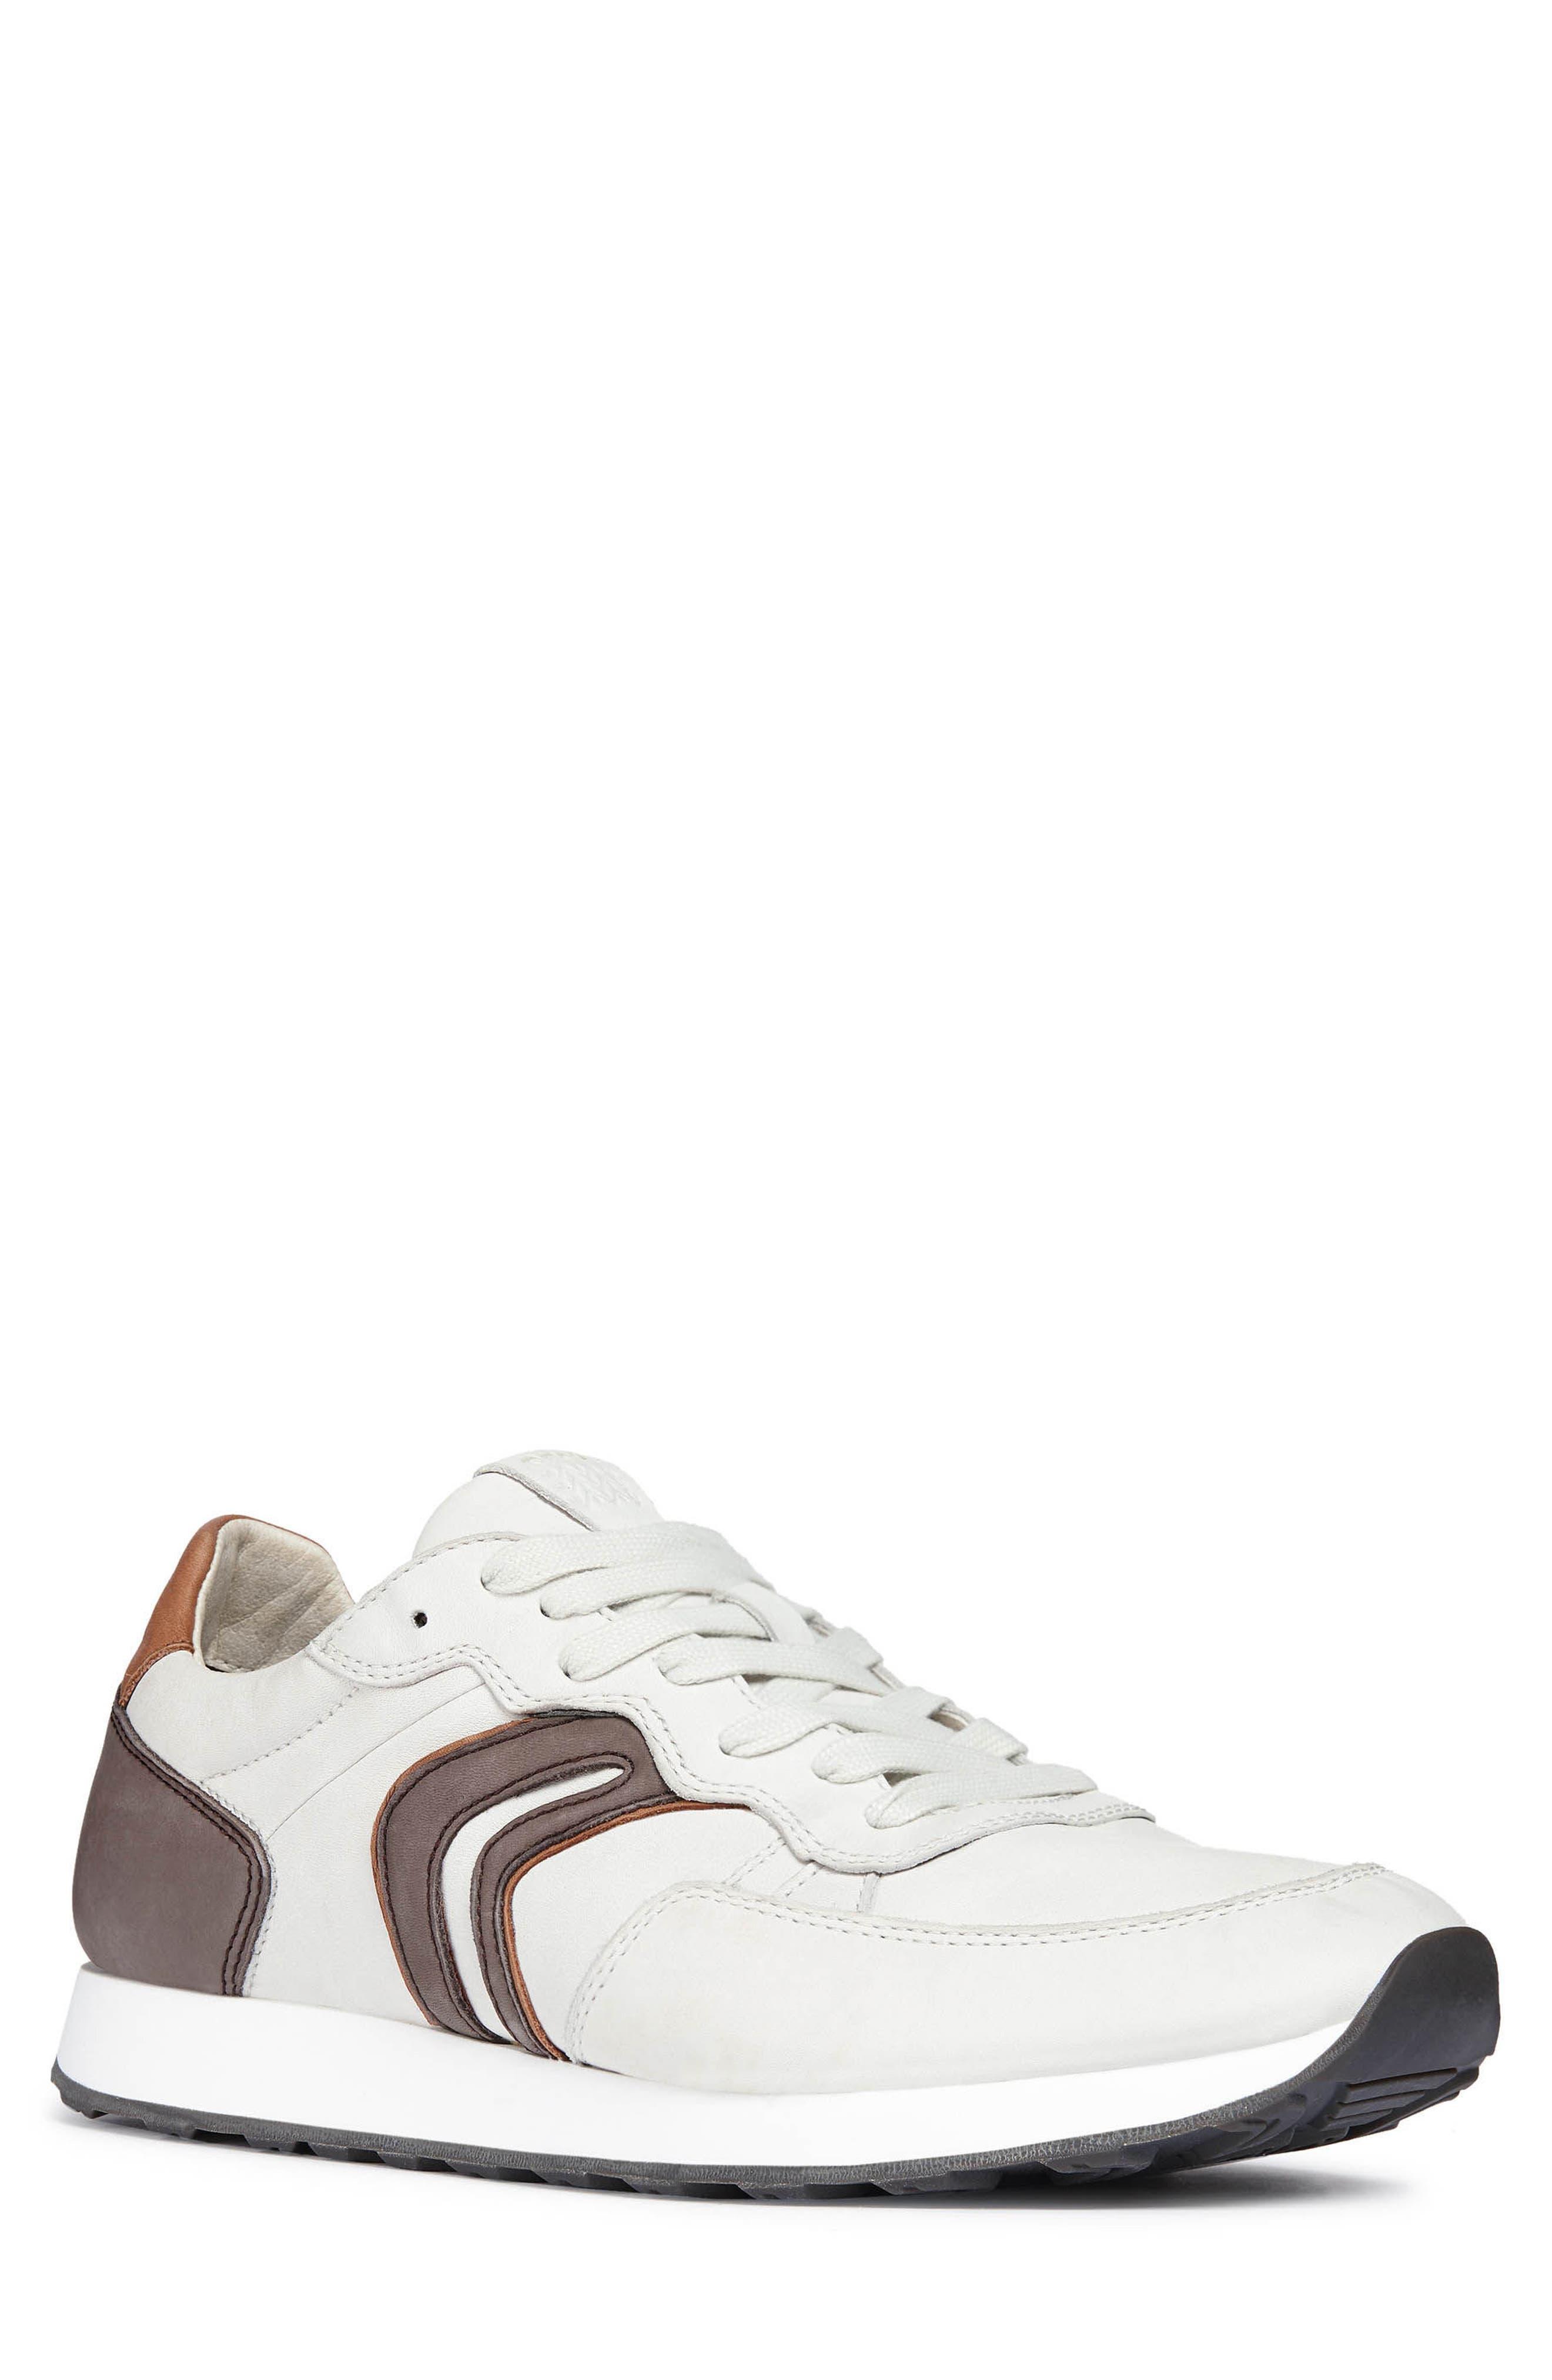 Vincint 1 Sneaker,                             Main thumbnail 1, color,                             WHITE/ DARK COFFEE LEATHER